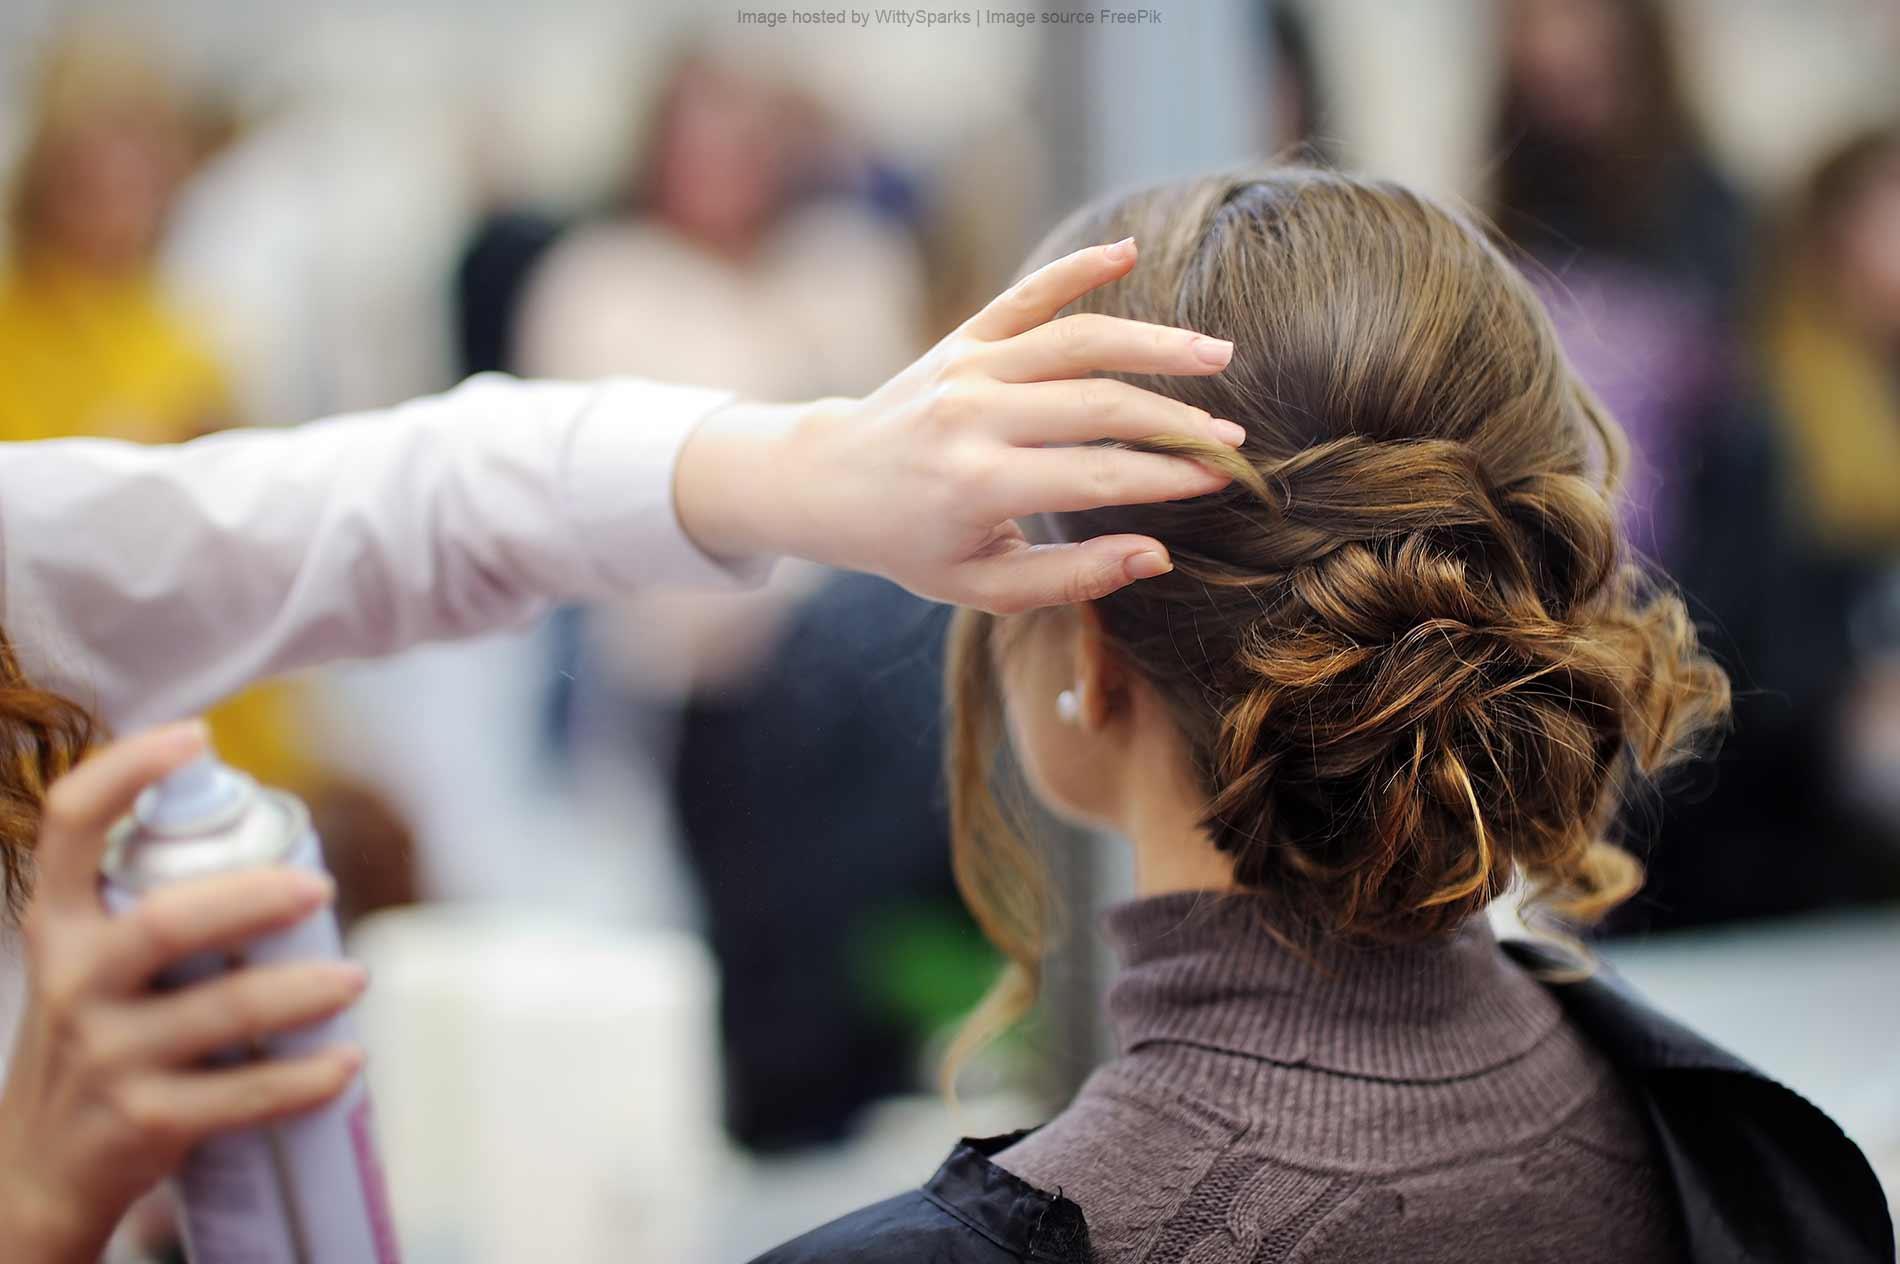 Self-employed hairdresser